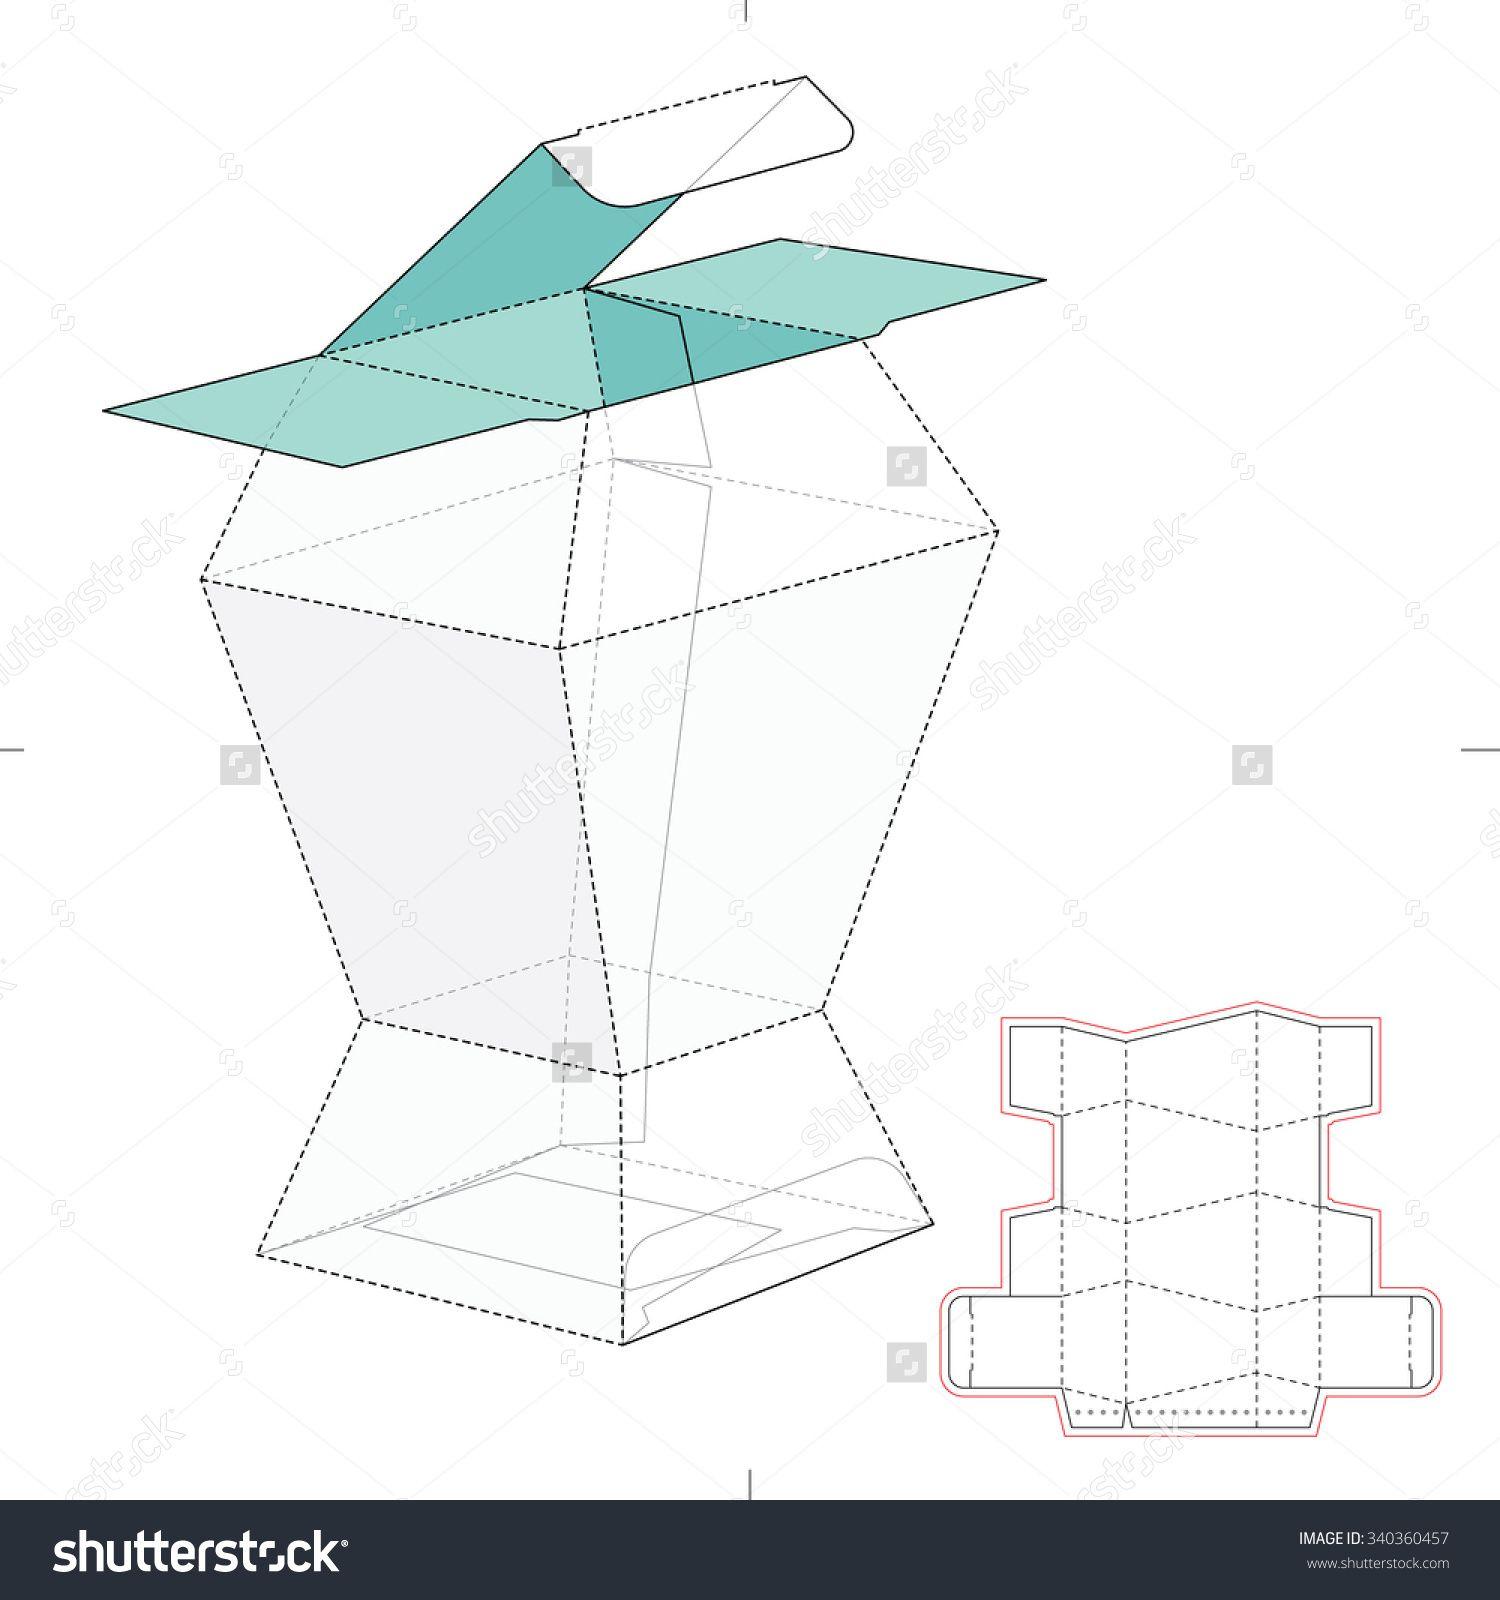 Pin by Antonio Acosta Vélez on Box, Cards & Origami ... - photo#44